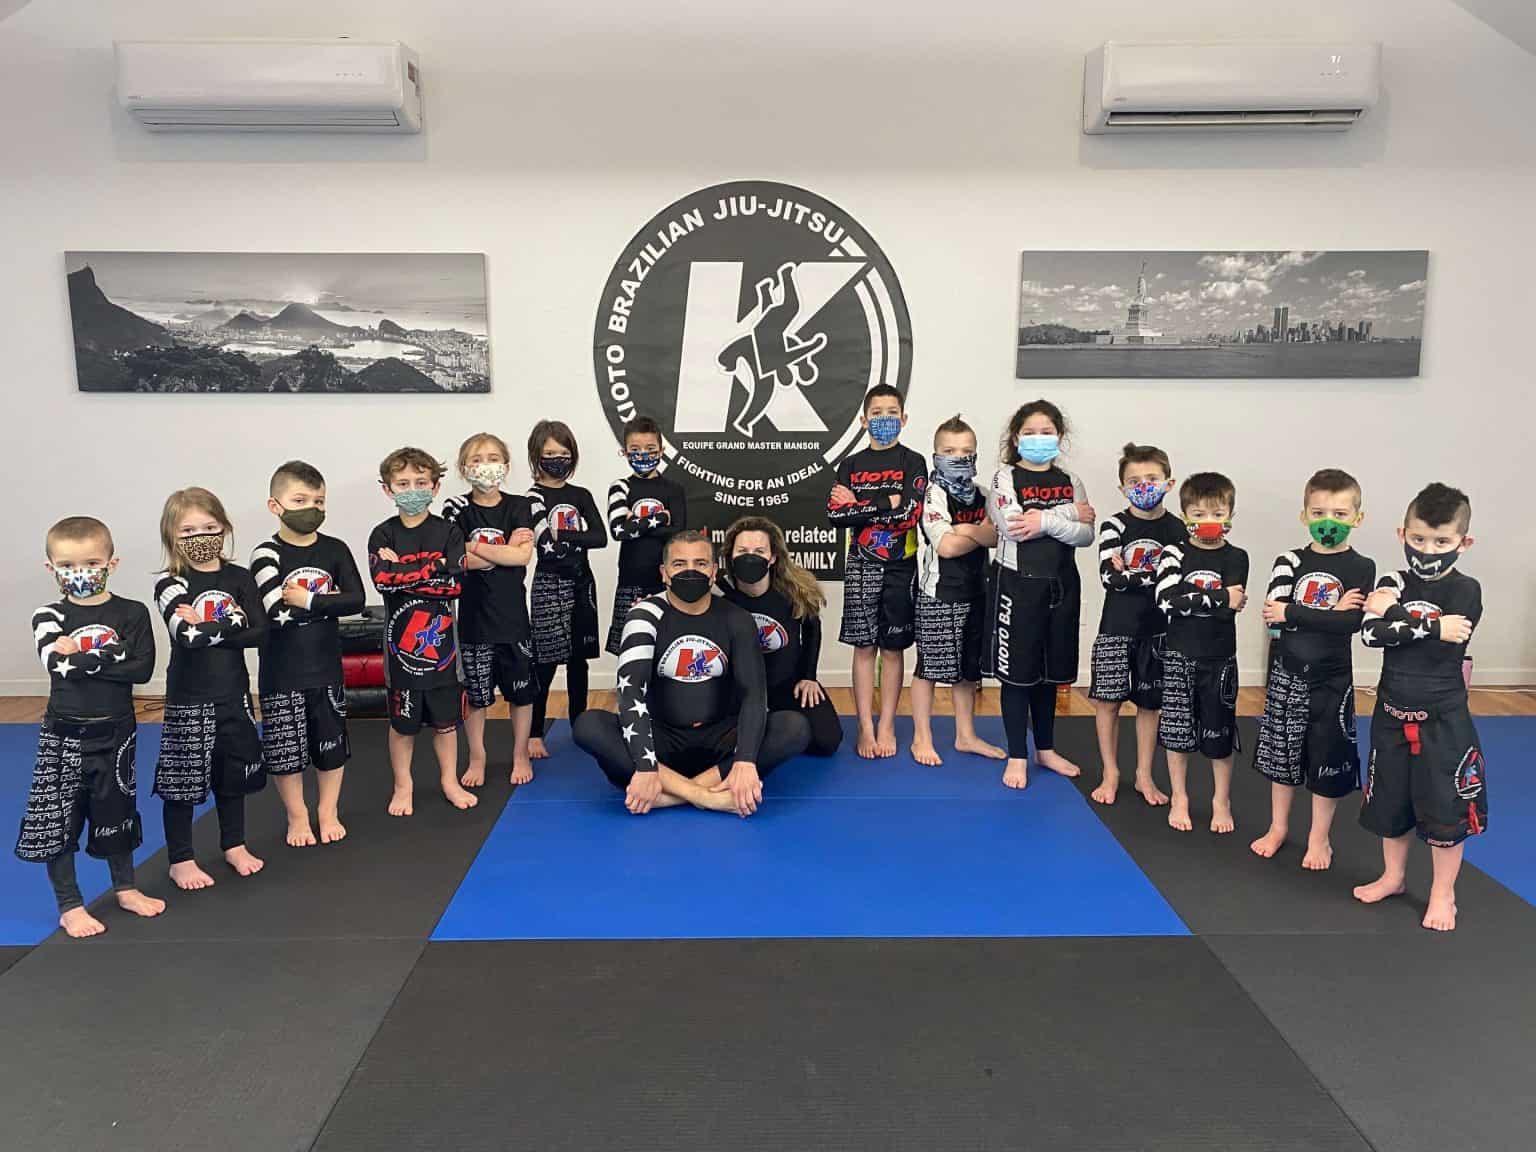 self defense classes for kids img1